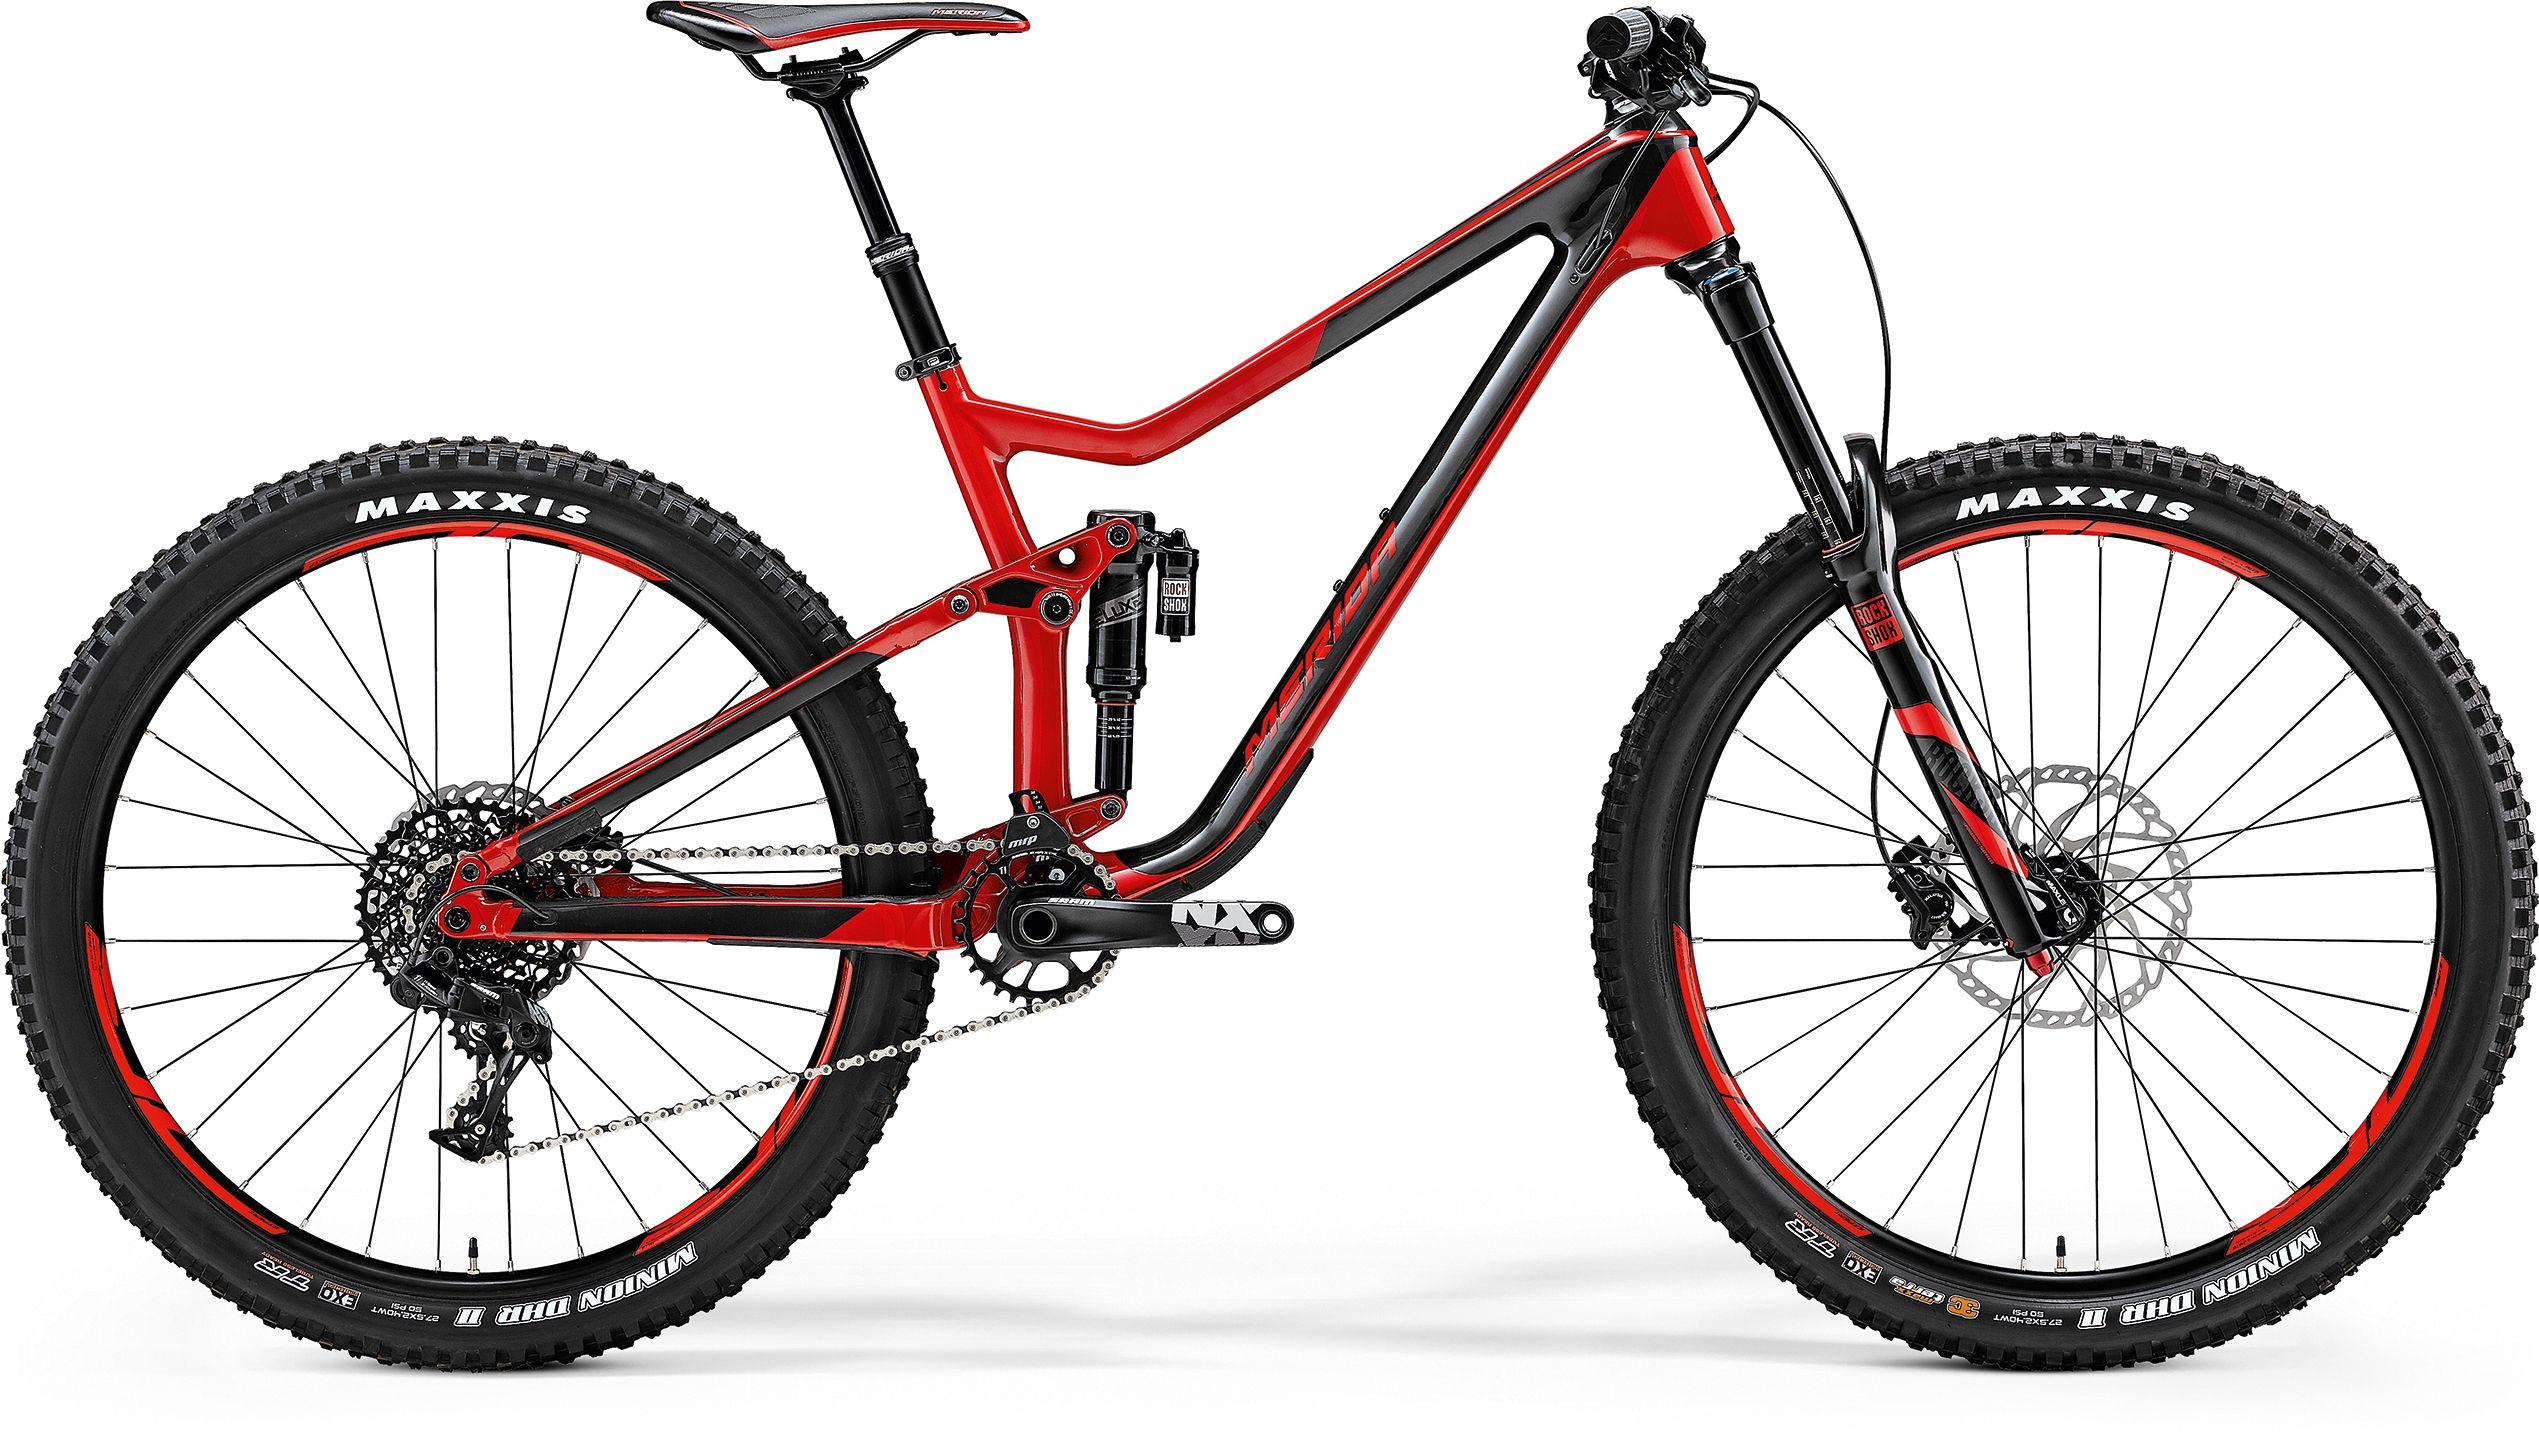 Велосипед Merida One-Sixty 5000 2017,  Двухподвесы  - артикул:268898